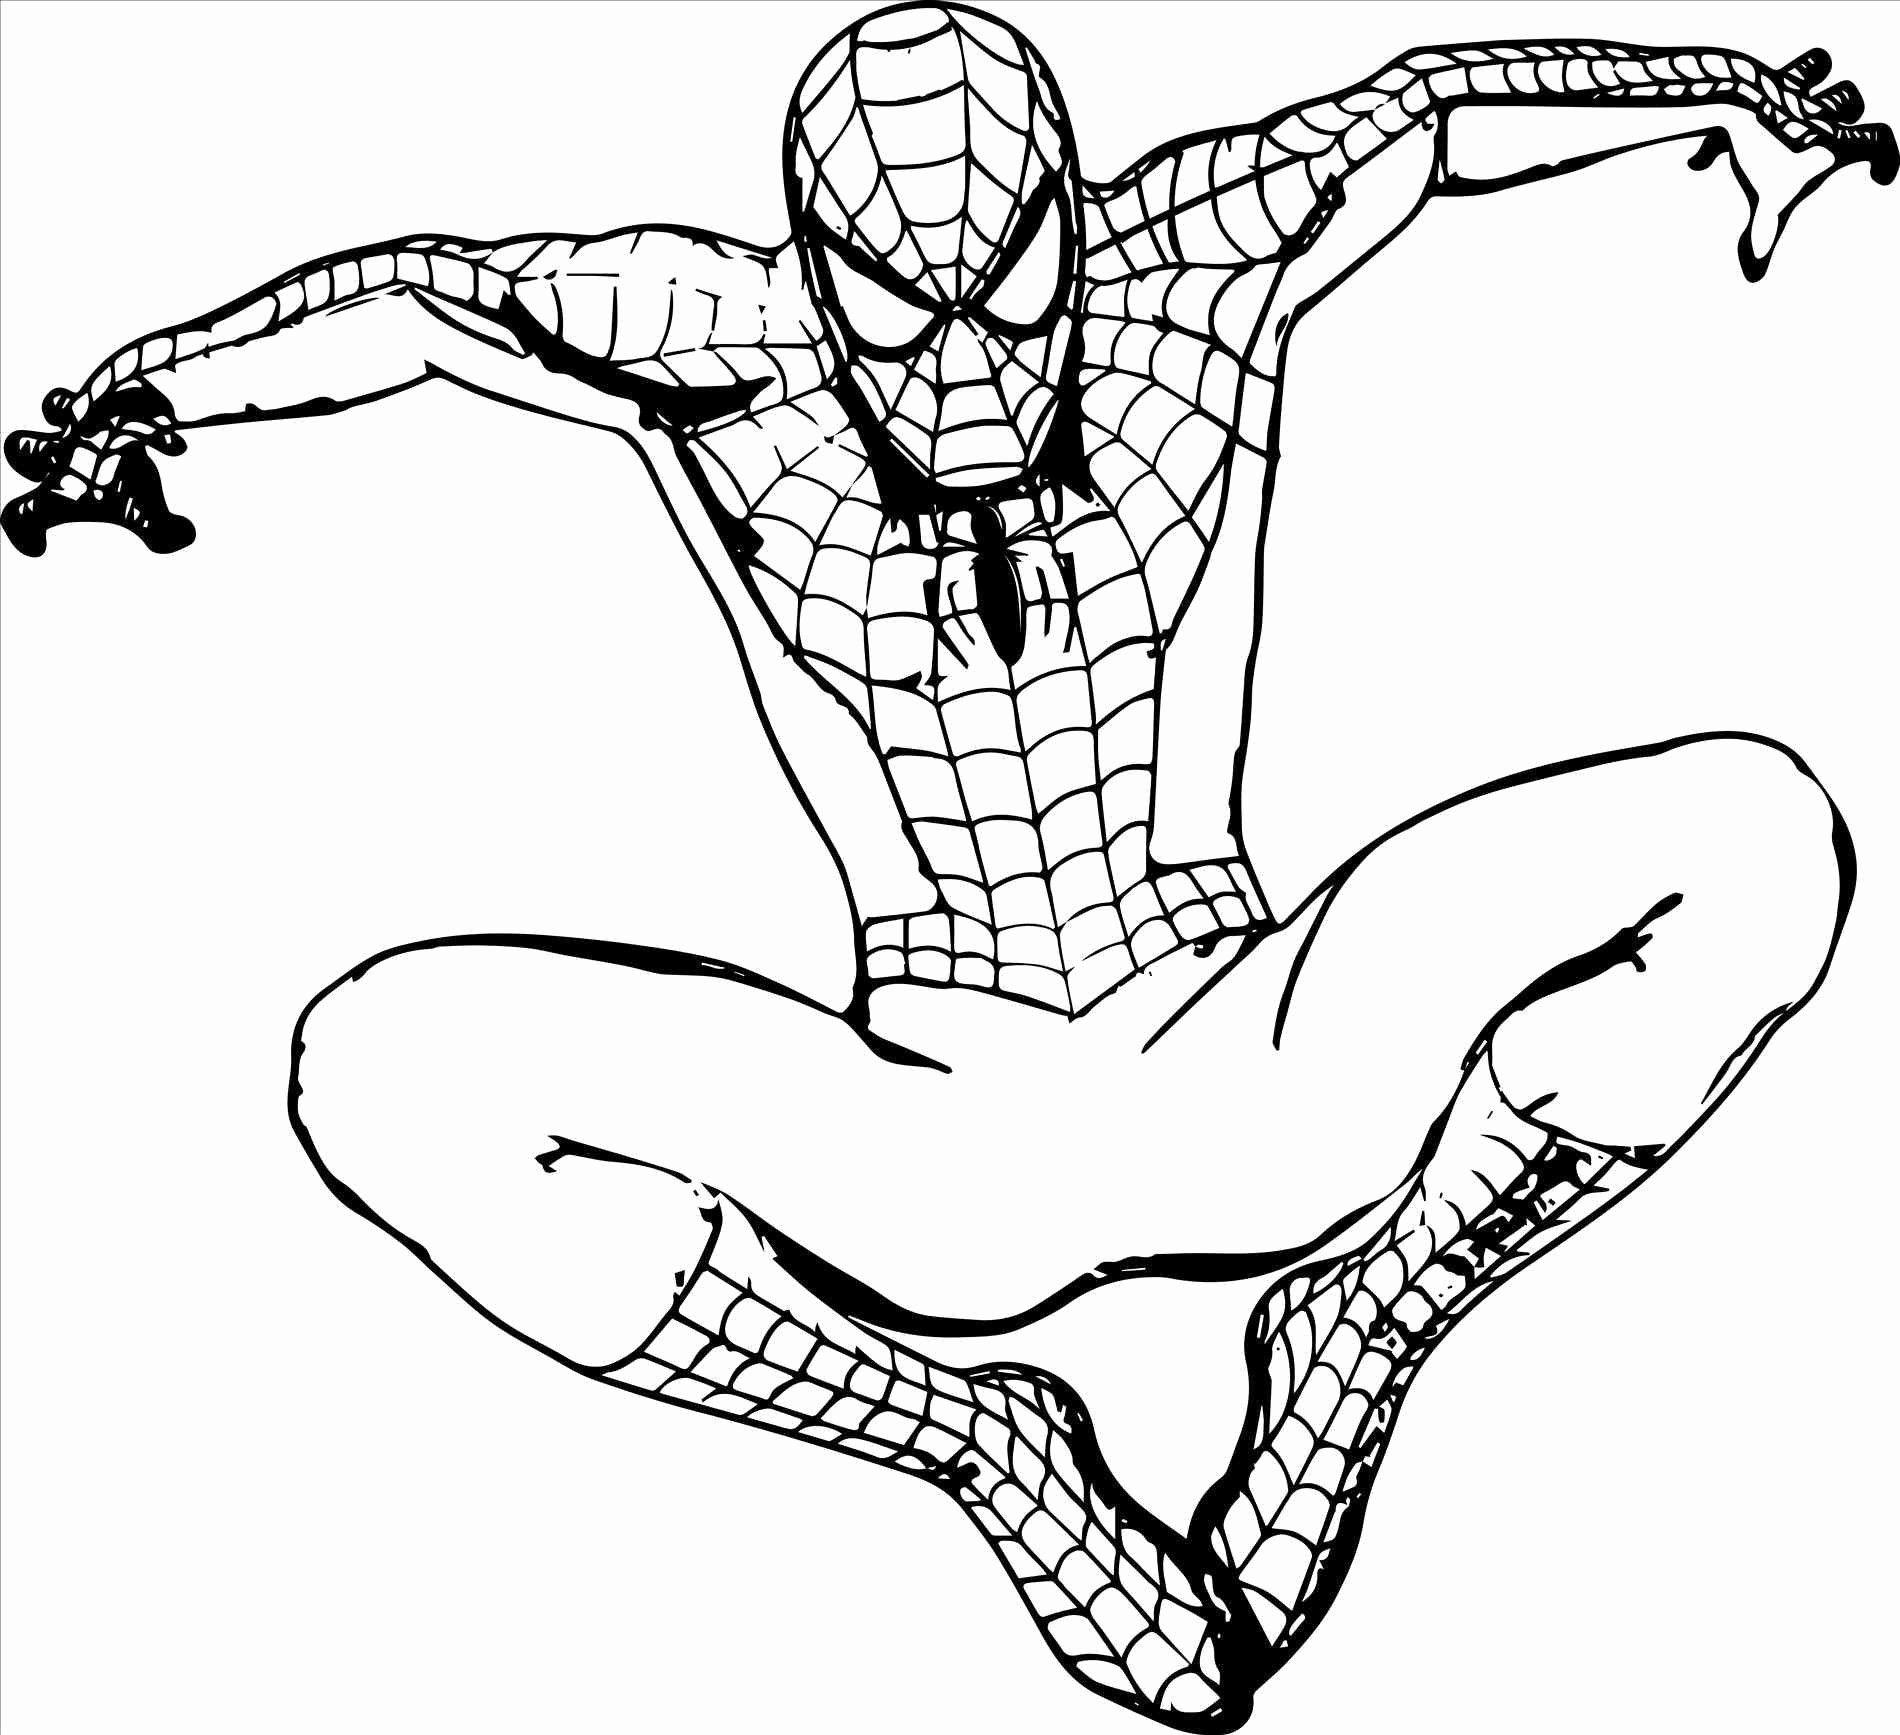 Superhero Coloring Books New 10 Super Hero Coloring Books Pdf Superhero Coloring Superhero Coloring Pages Superhero Coloring Spiderman Coloring